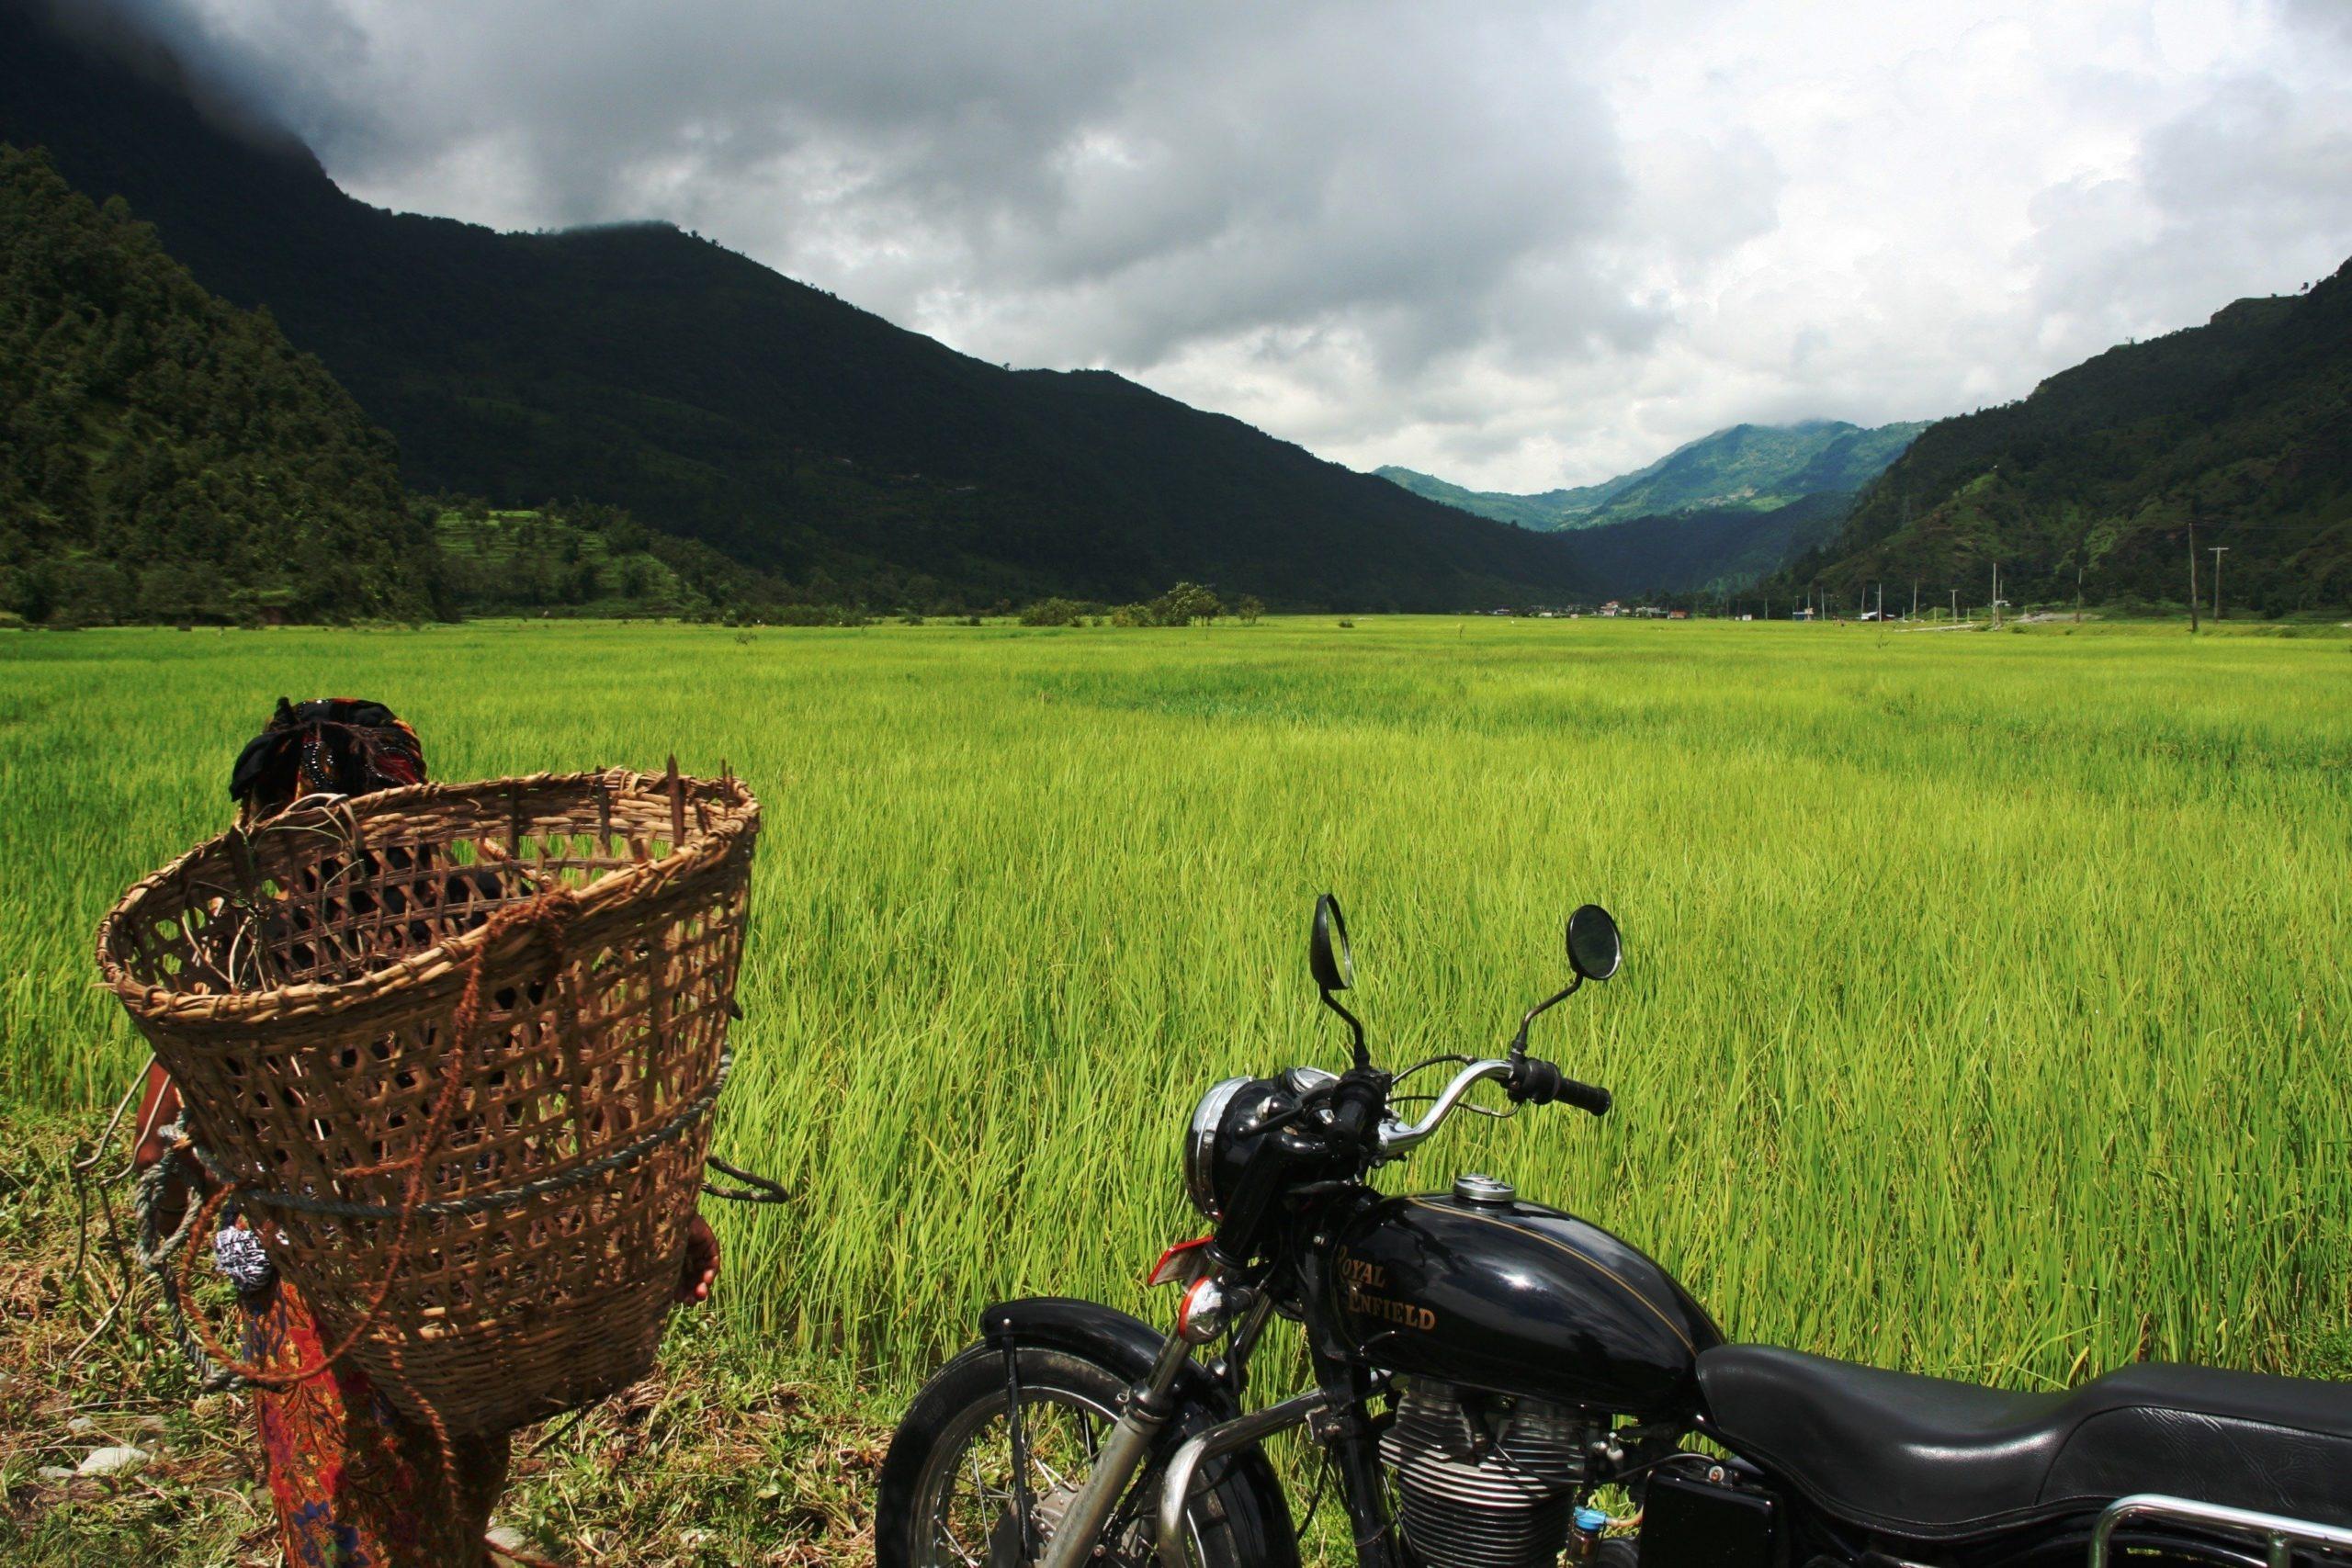 Motorrad-Roadtrip Nepal & Bhutan - Das Ewige Nepal